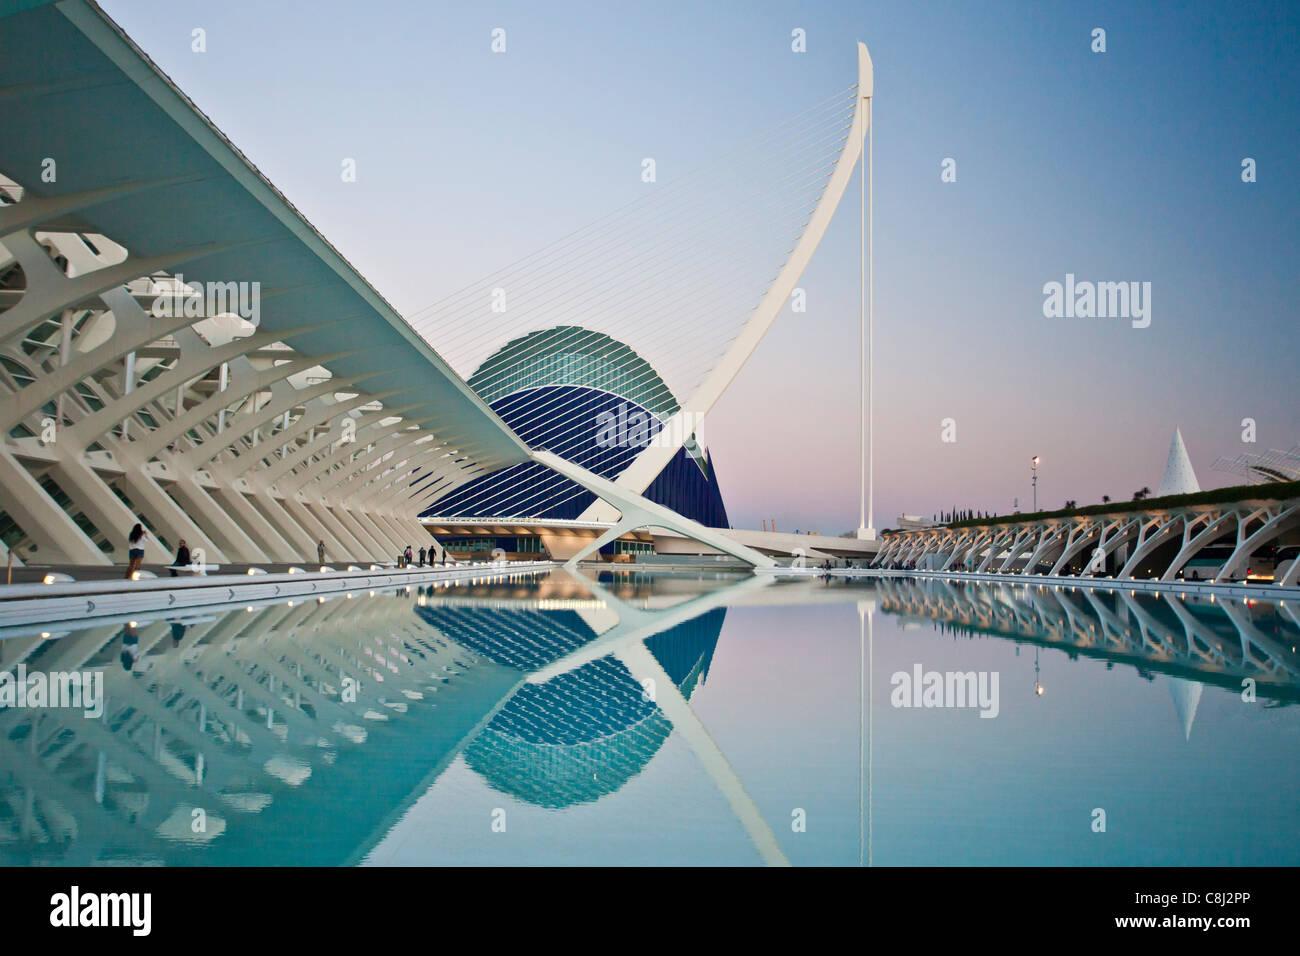 Spain, Europe, Valencia, City of Arts and Science, Calatrava, architecture, modern, Assut del Or, Bridge, Agora, - Stock Image